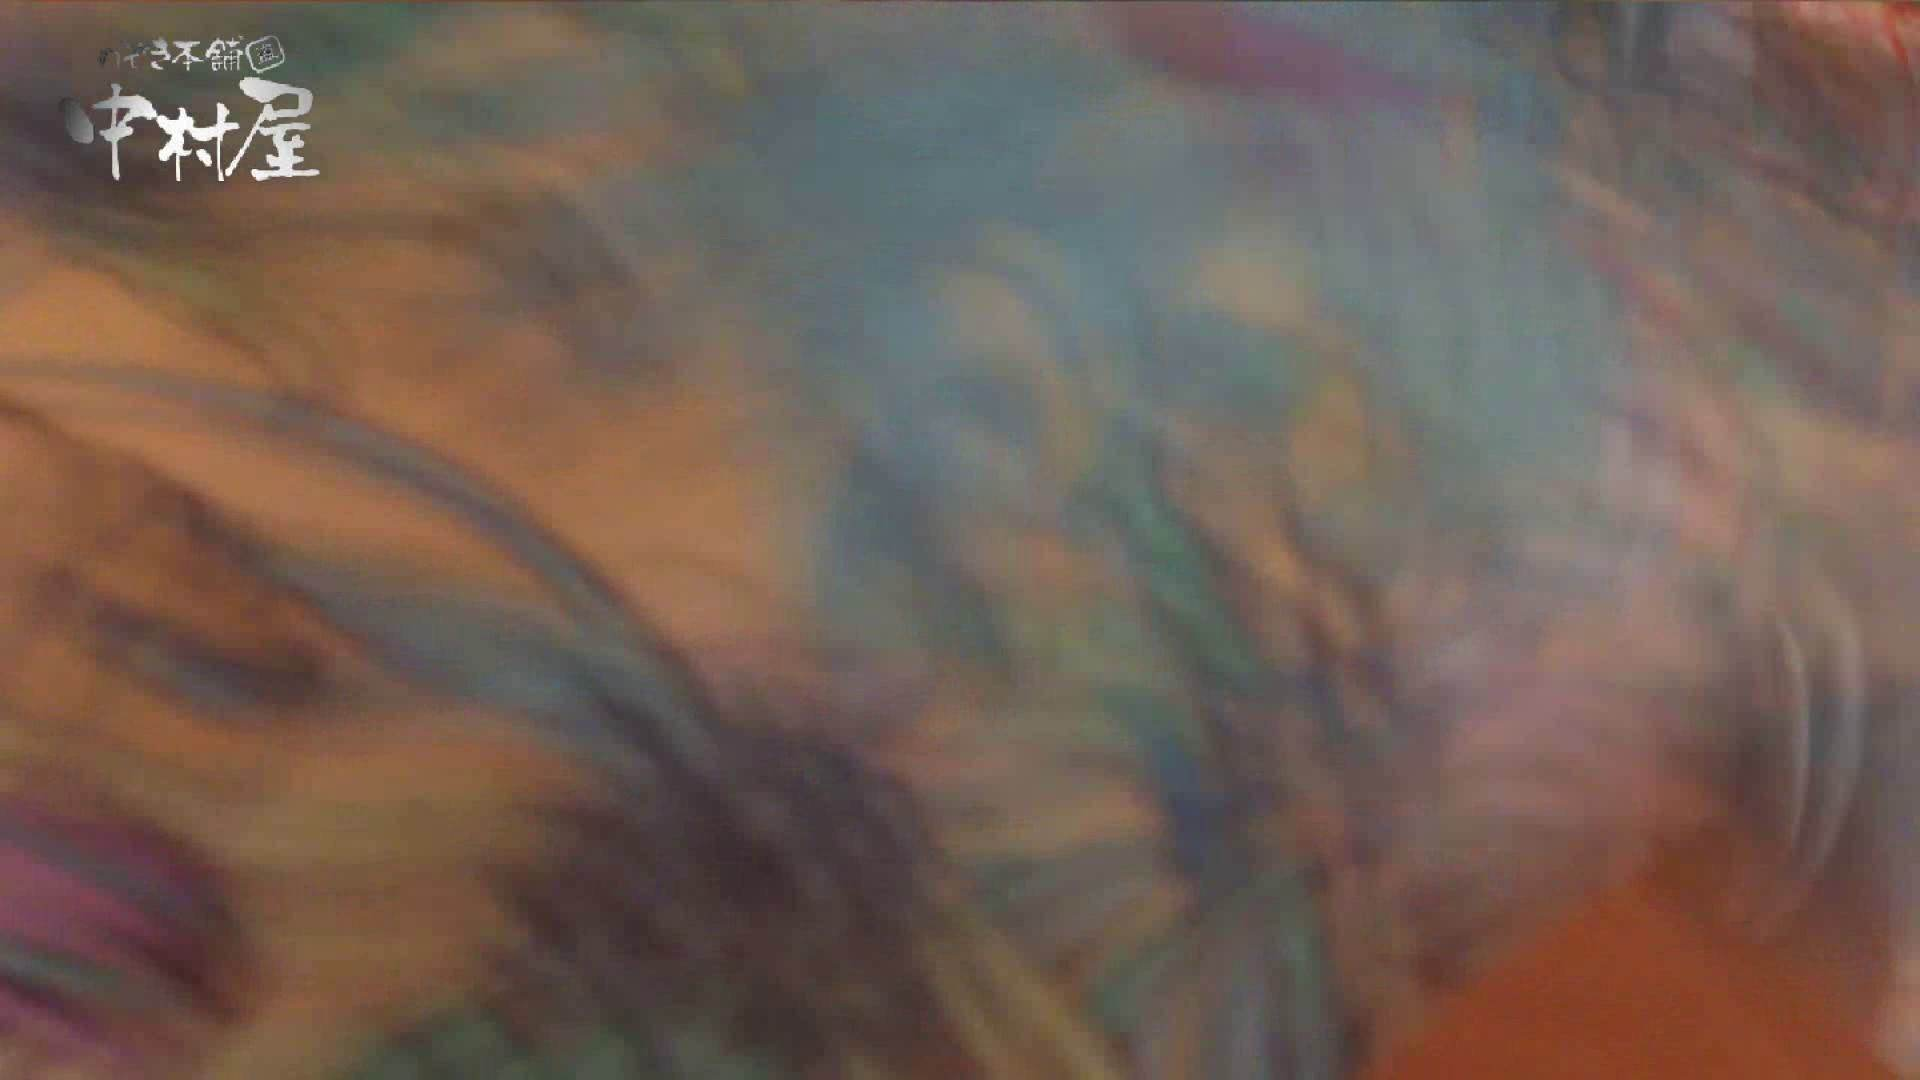 vol.43 可愛いカリスマ店員限定‼胸チラ&パンチラ 美脚おねーさんの胸元ゲット! パンチラのぞき セックス無修正動画無料 86画像 45